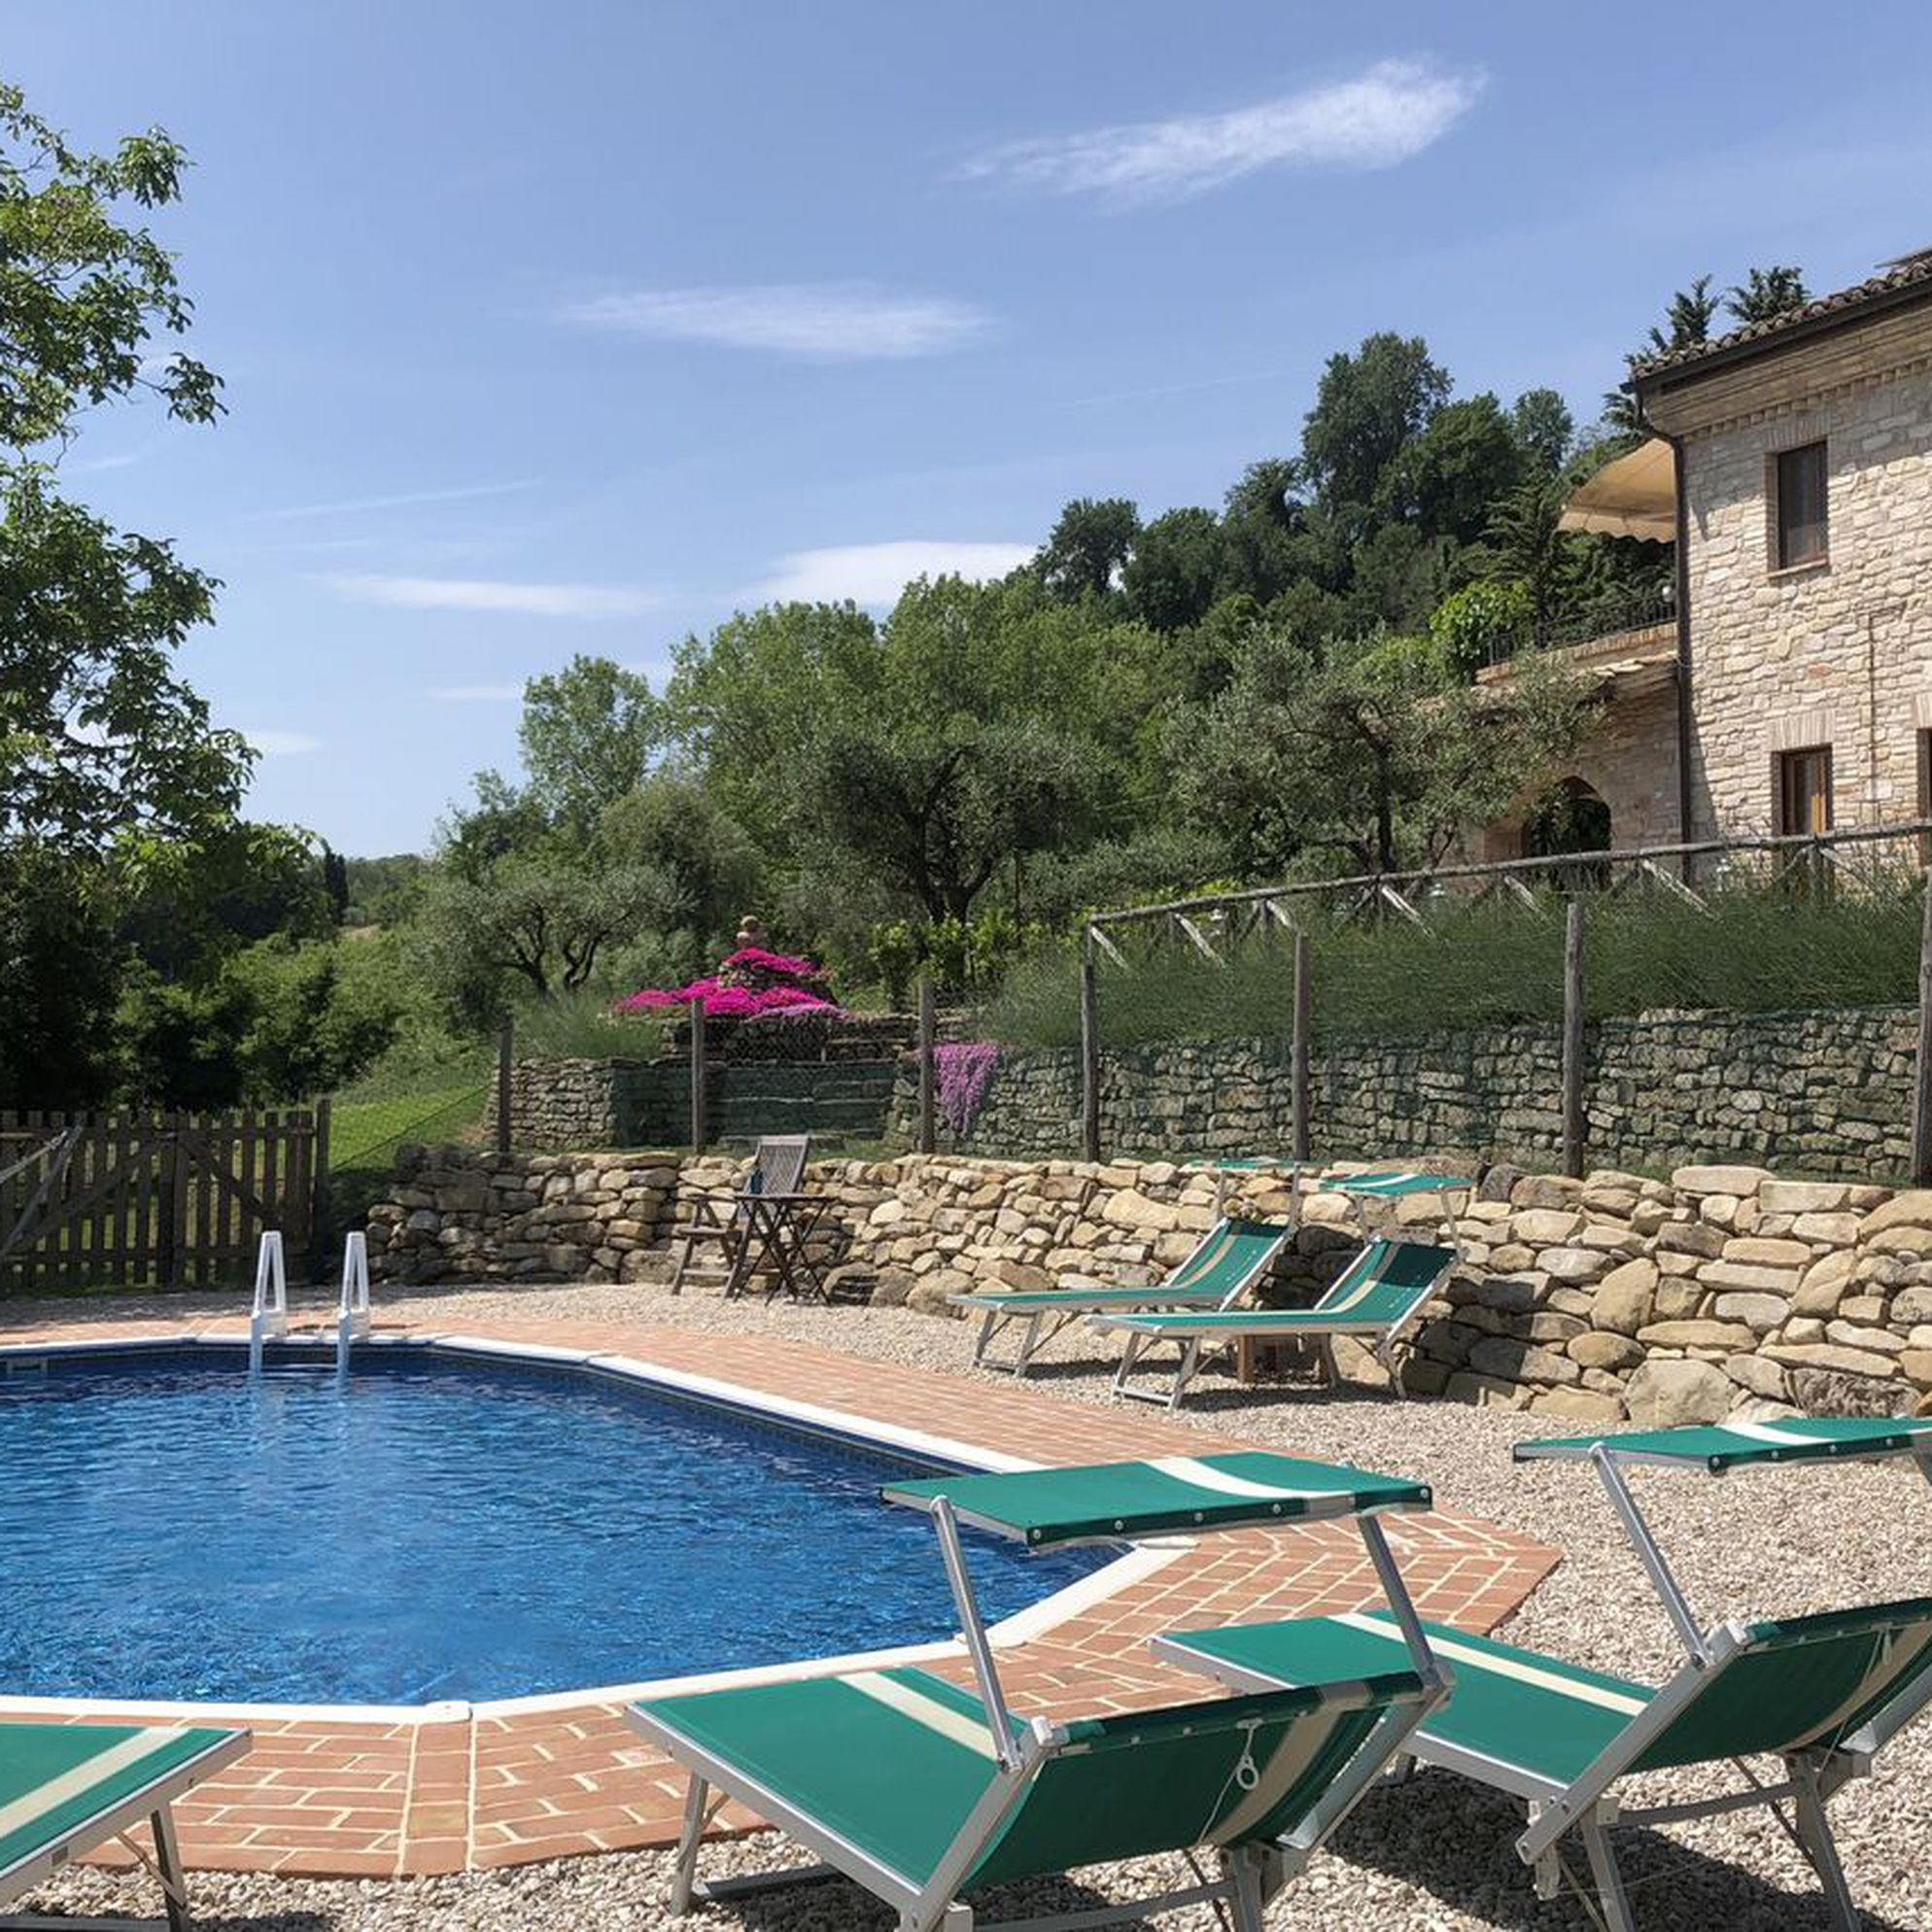 Villa in the Vineyard